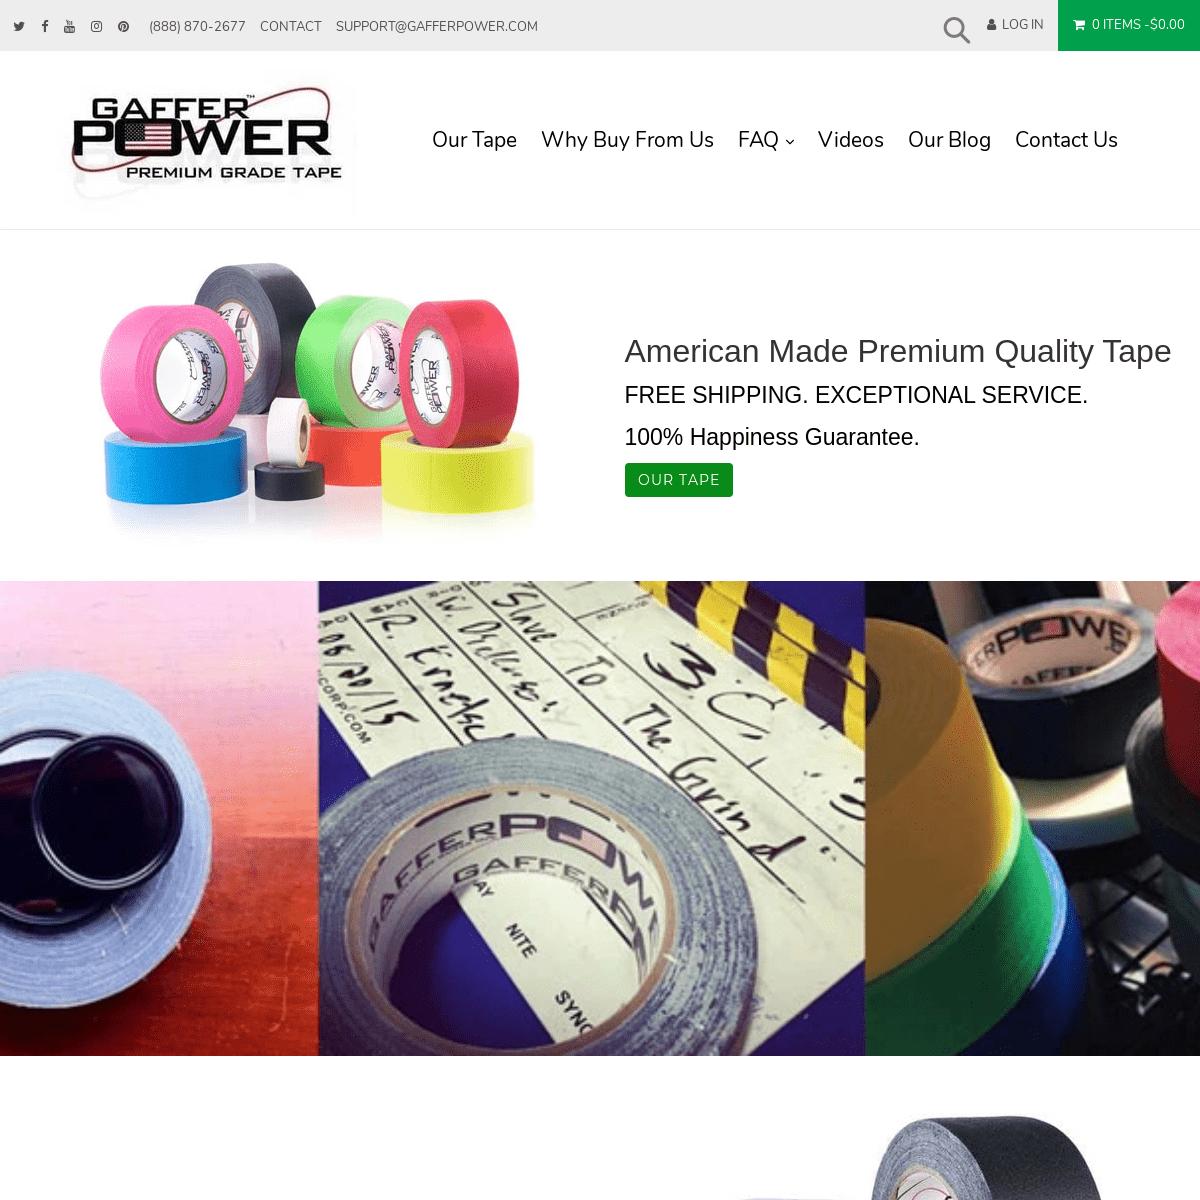 Premium Grade Professional Gaffer Tape and Tools – Gaffer Power